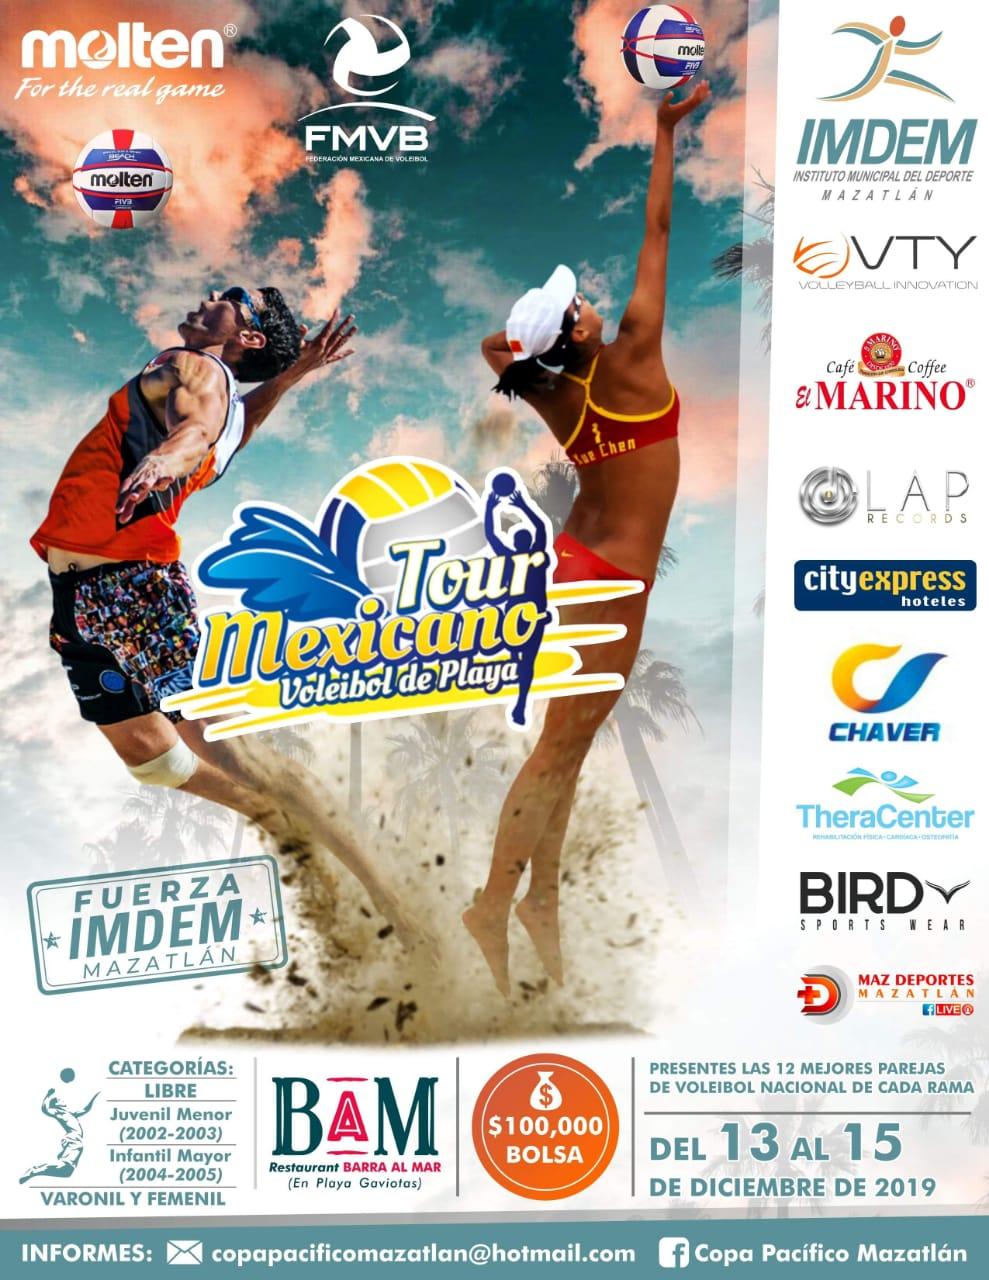 Tour Mexicano